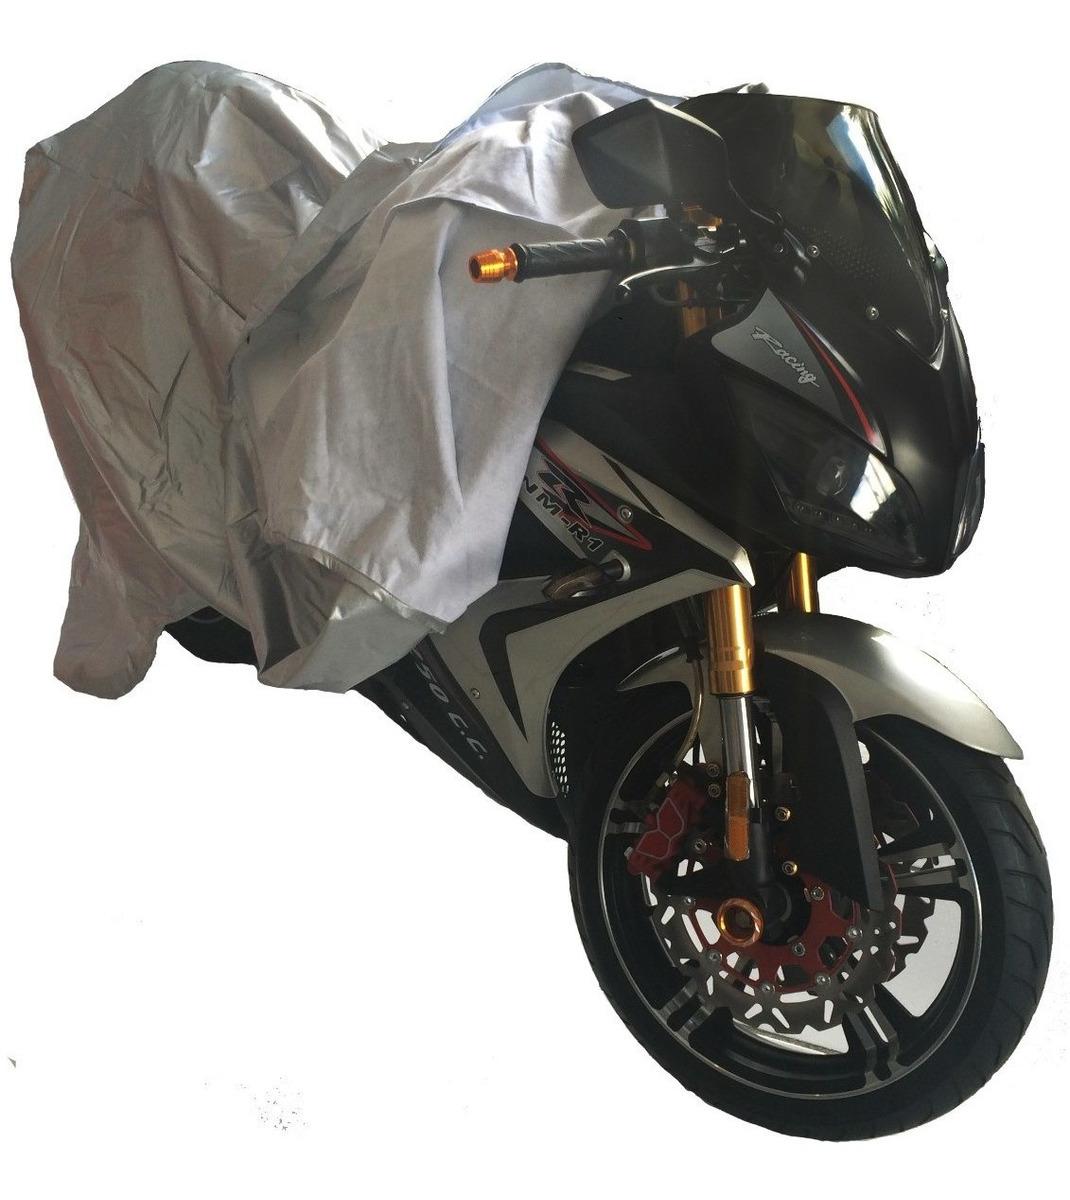 768e178d596 Funda Para Moto, Impermeable Y Afelpada - $ 1,180.00 en Mercado Libre